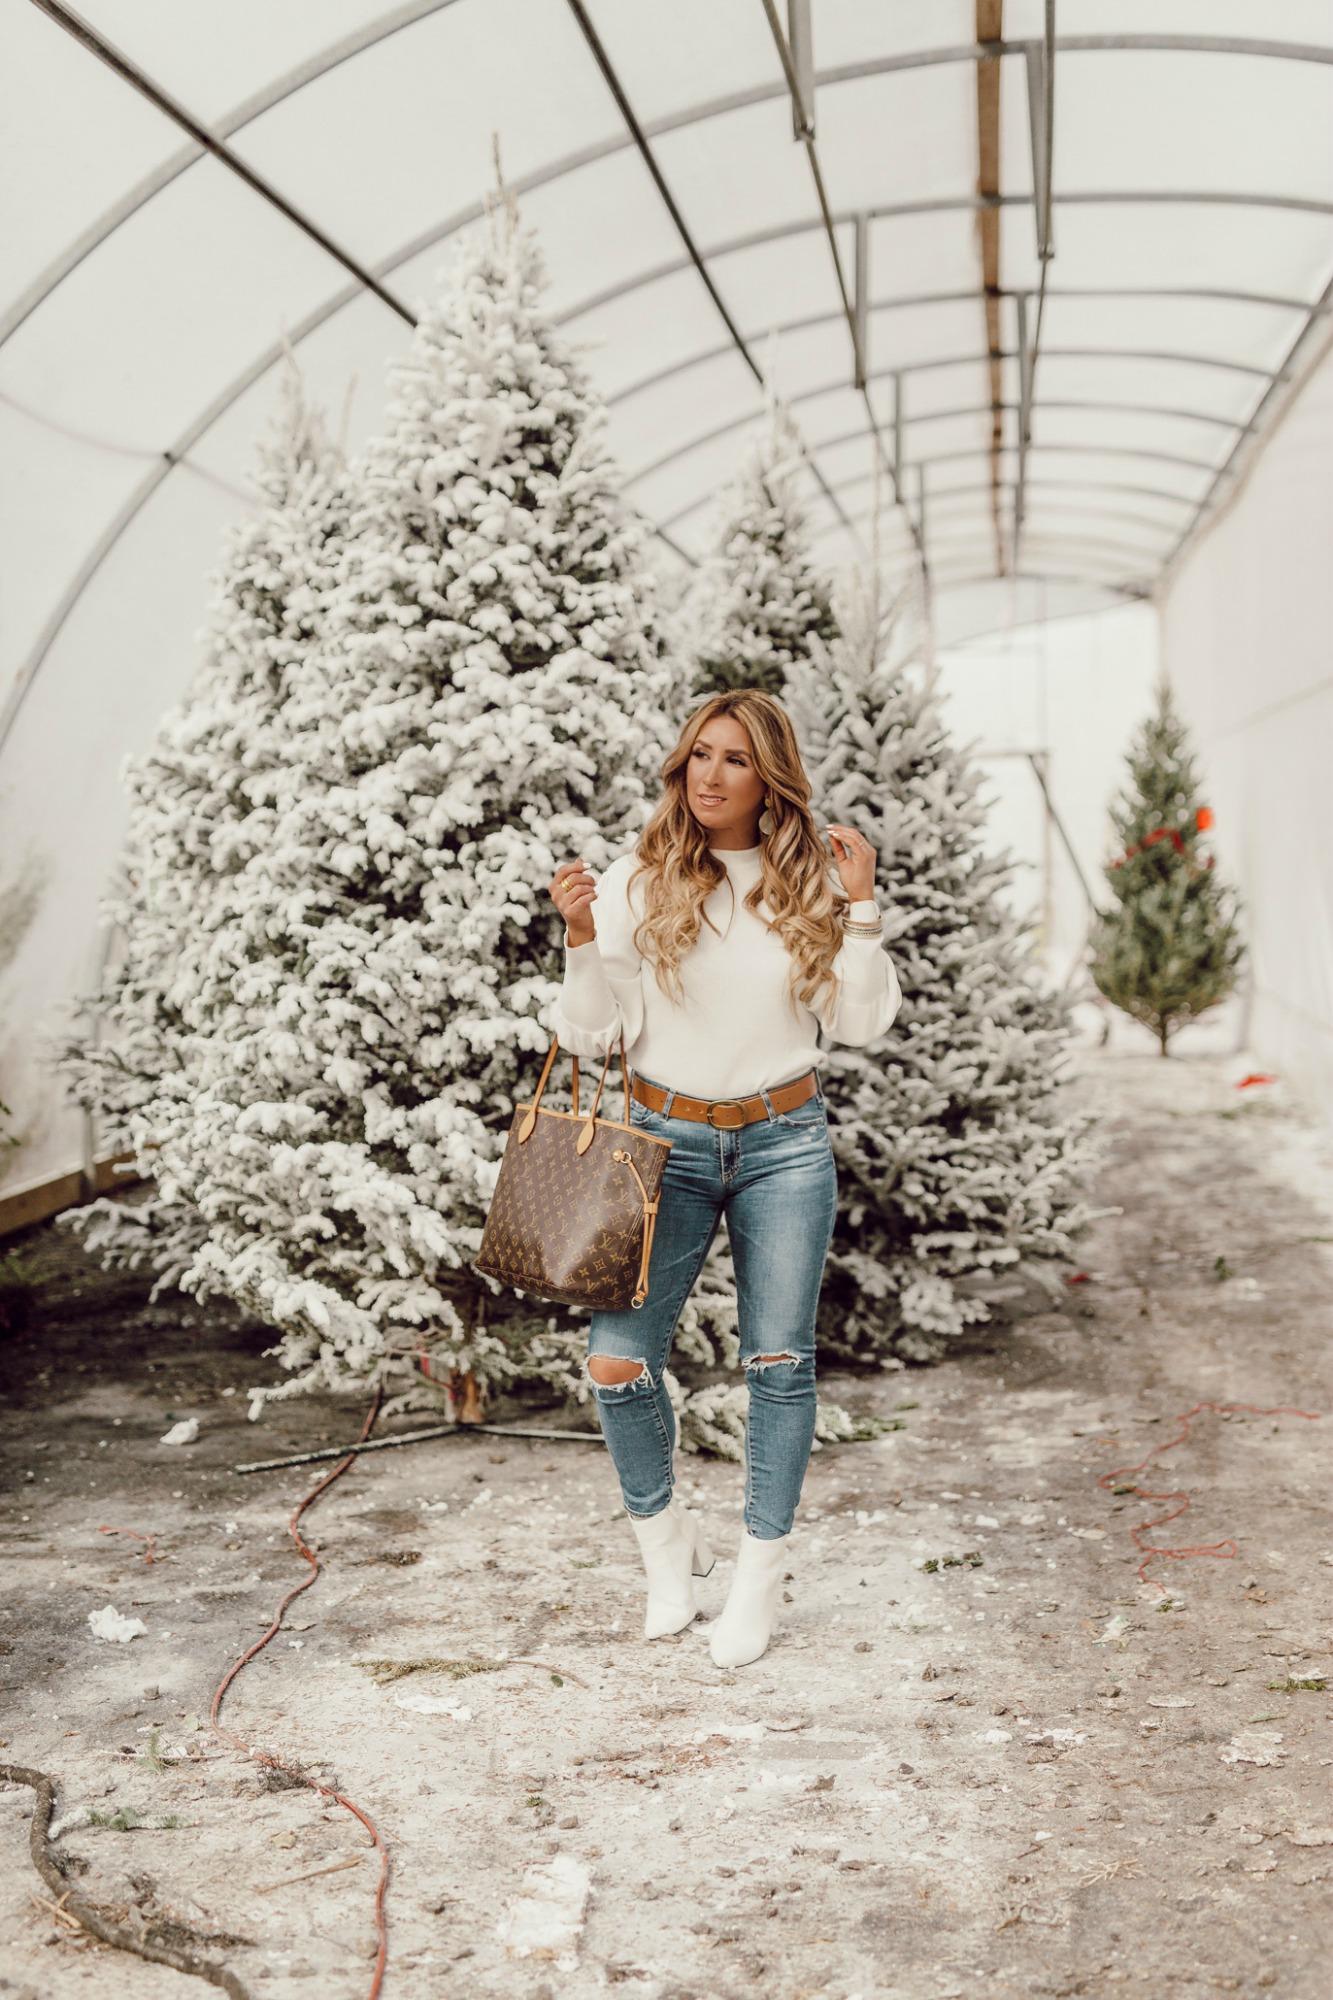 Best fitting skinny jeans for women